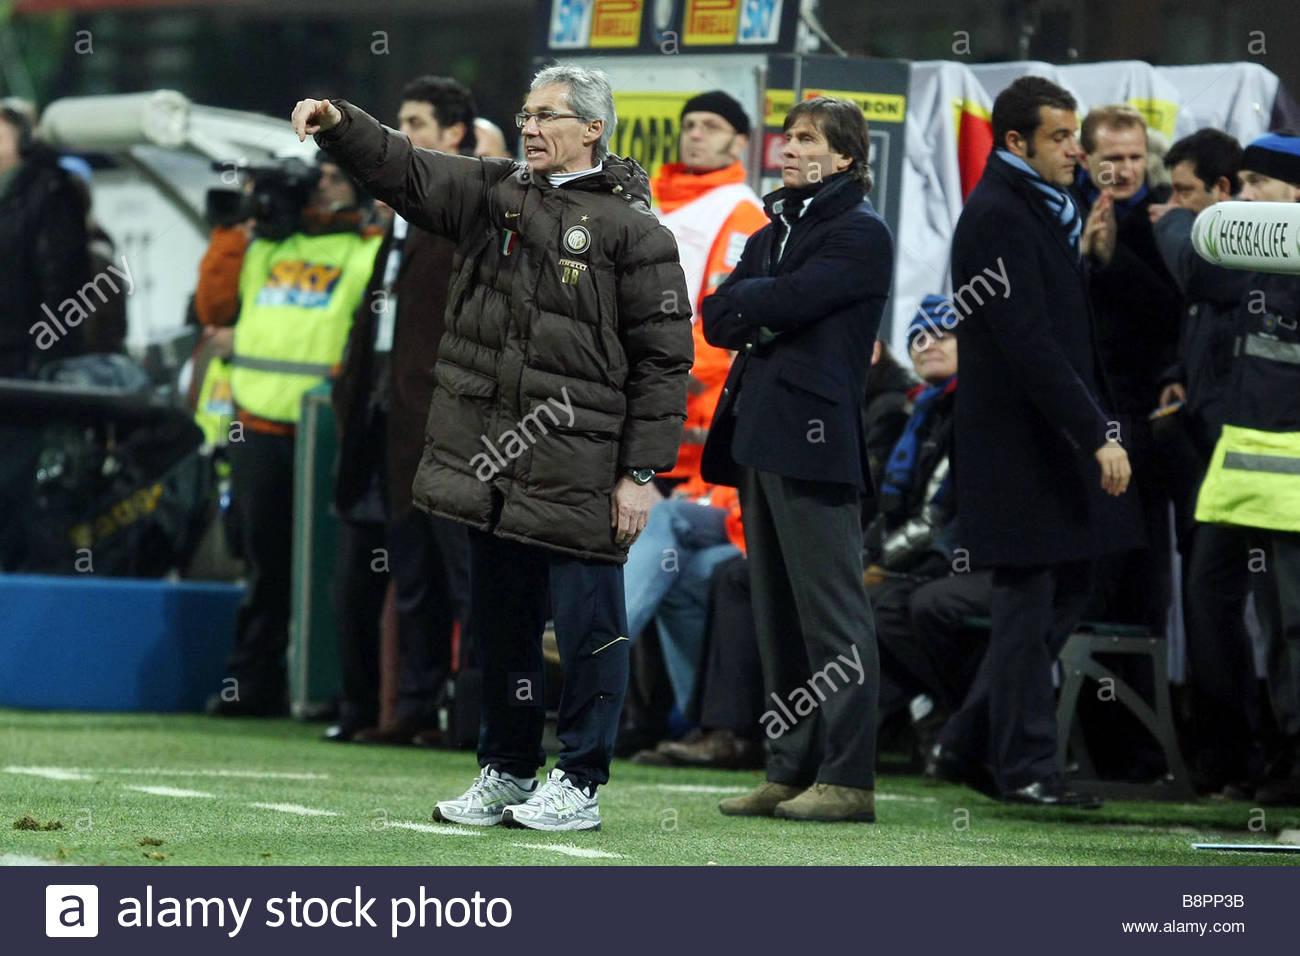 giuseppe baresi inter vice trainer'milano 2009 'serie a football championship 2008/2009 'inter-sampdoria - Stock Image